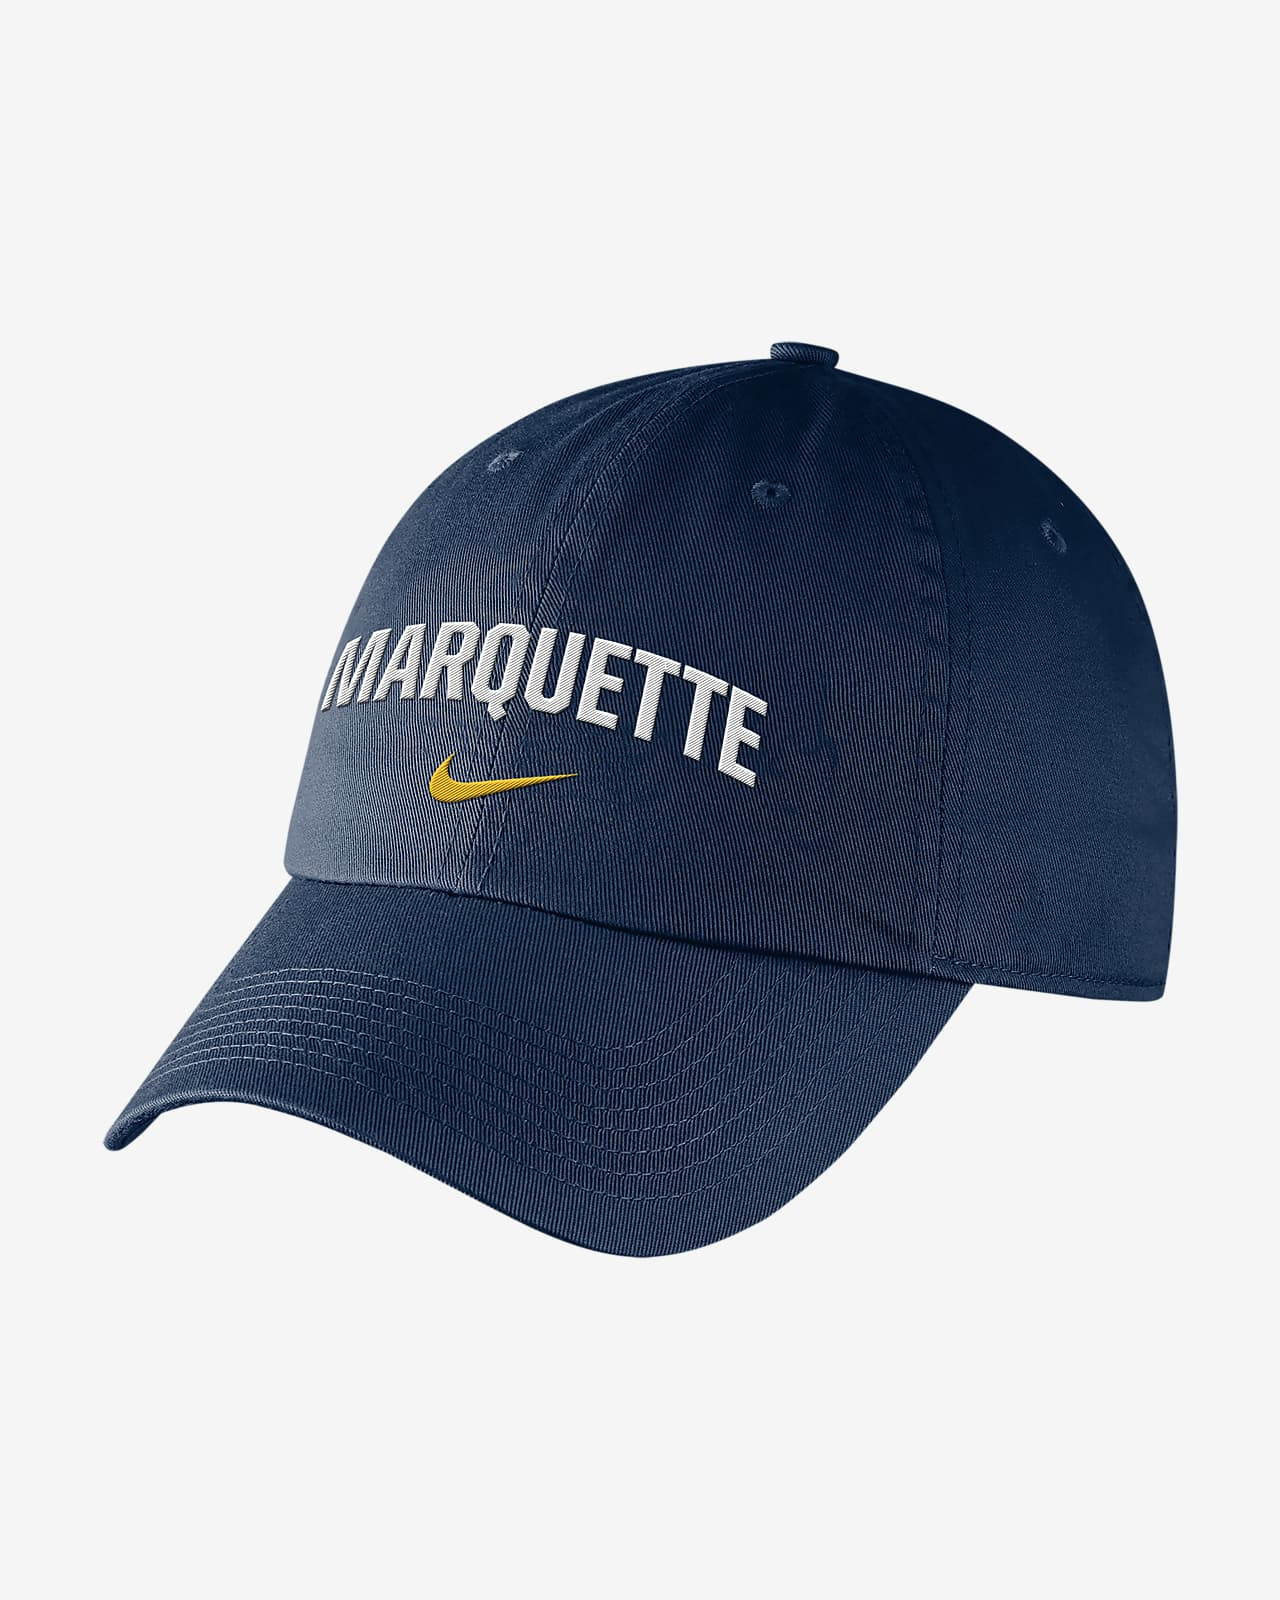 Nike College (Marquette) Hat